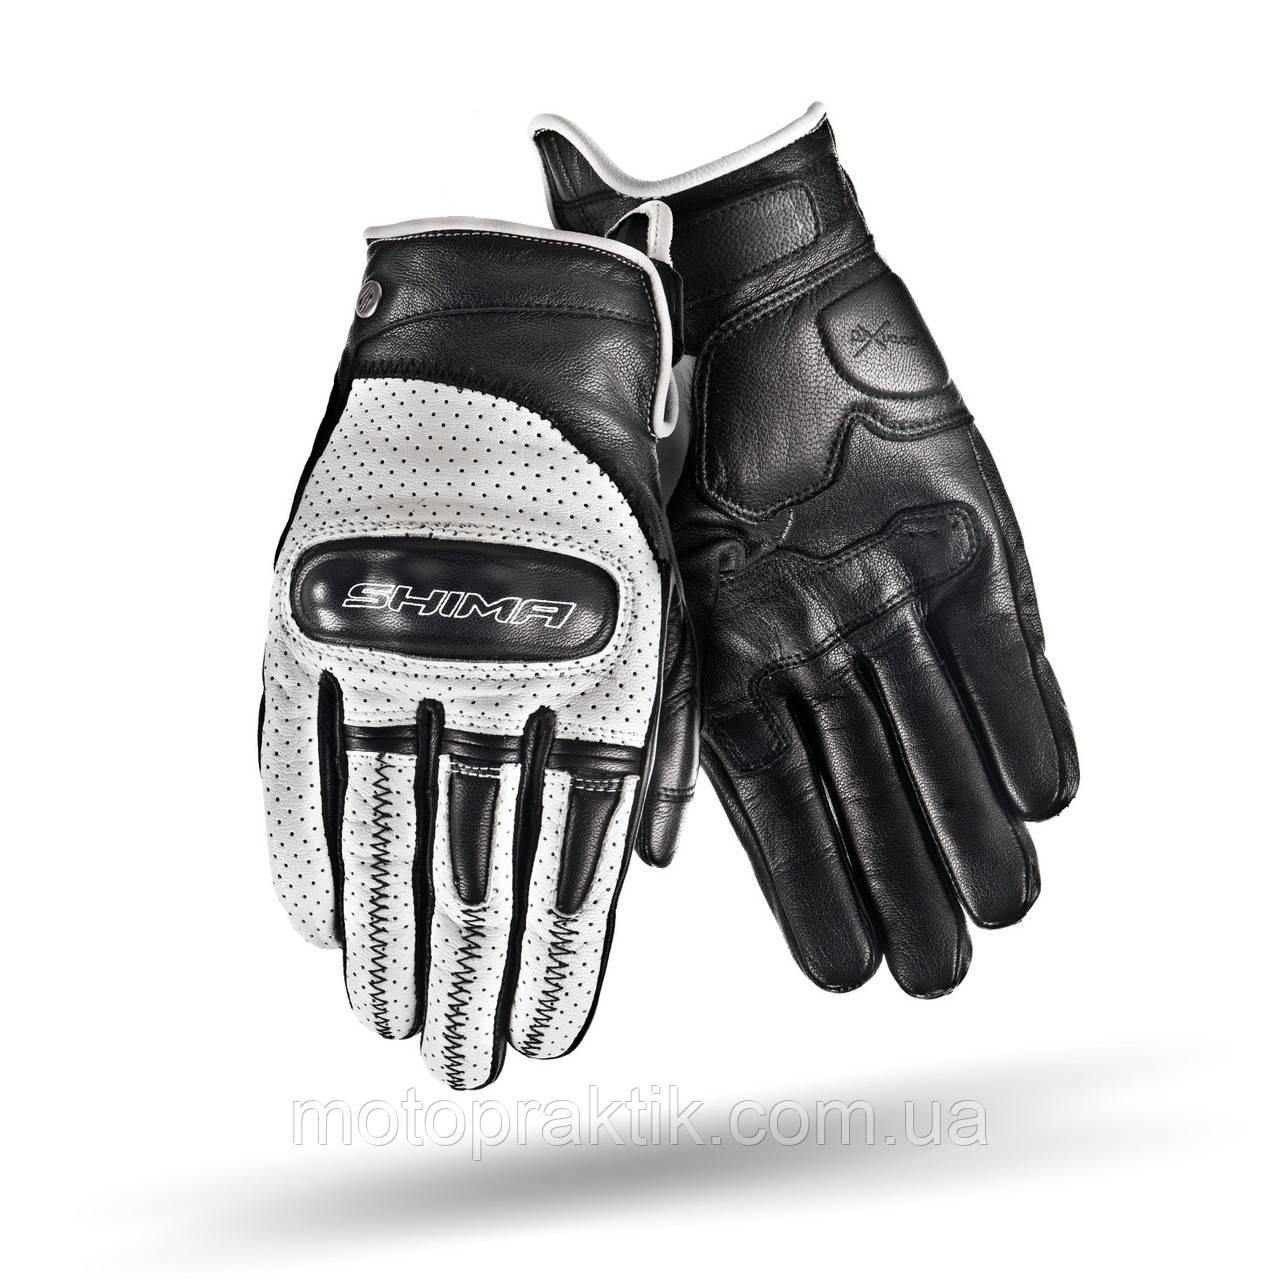 SHIMA CALIBER Gloves Black/White, S Мото рукавички літні шкіряні із захистом